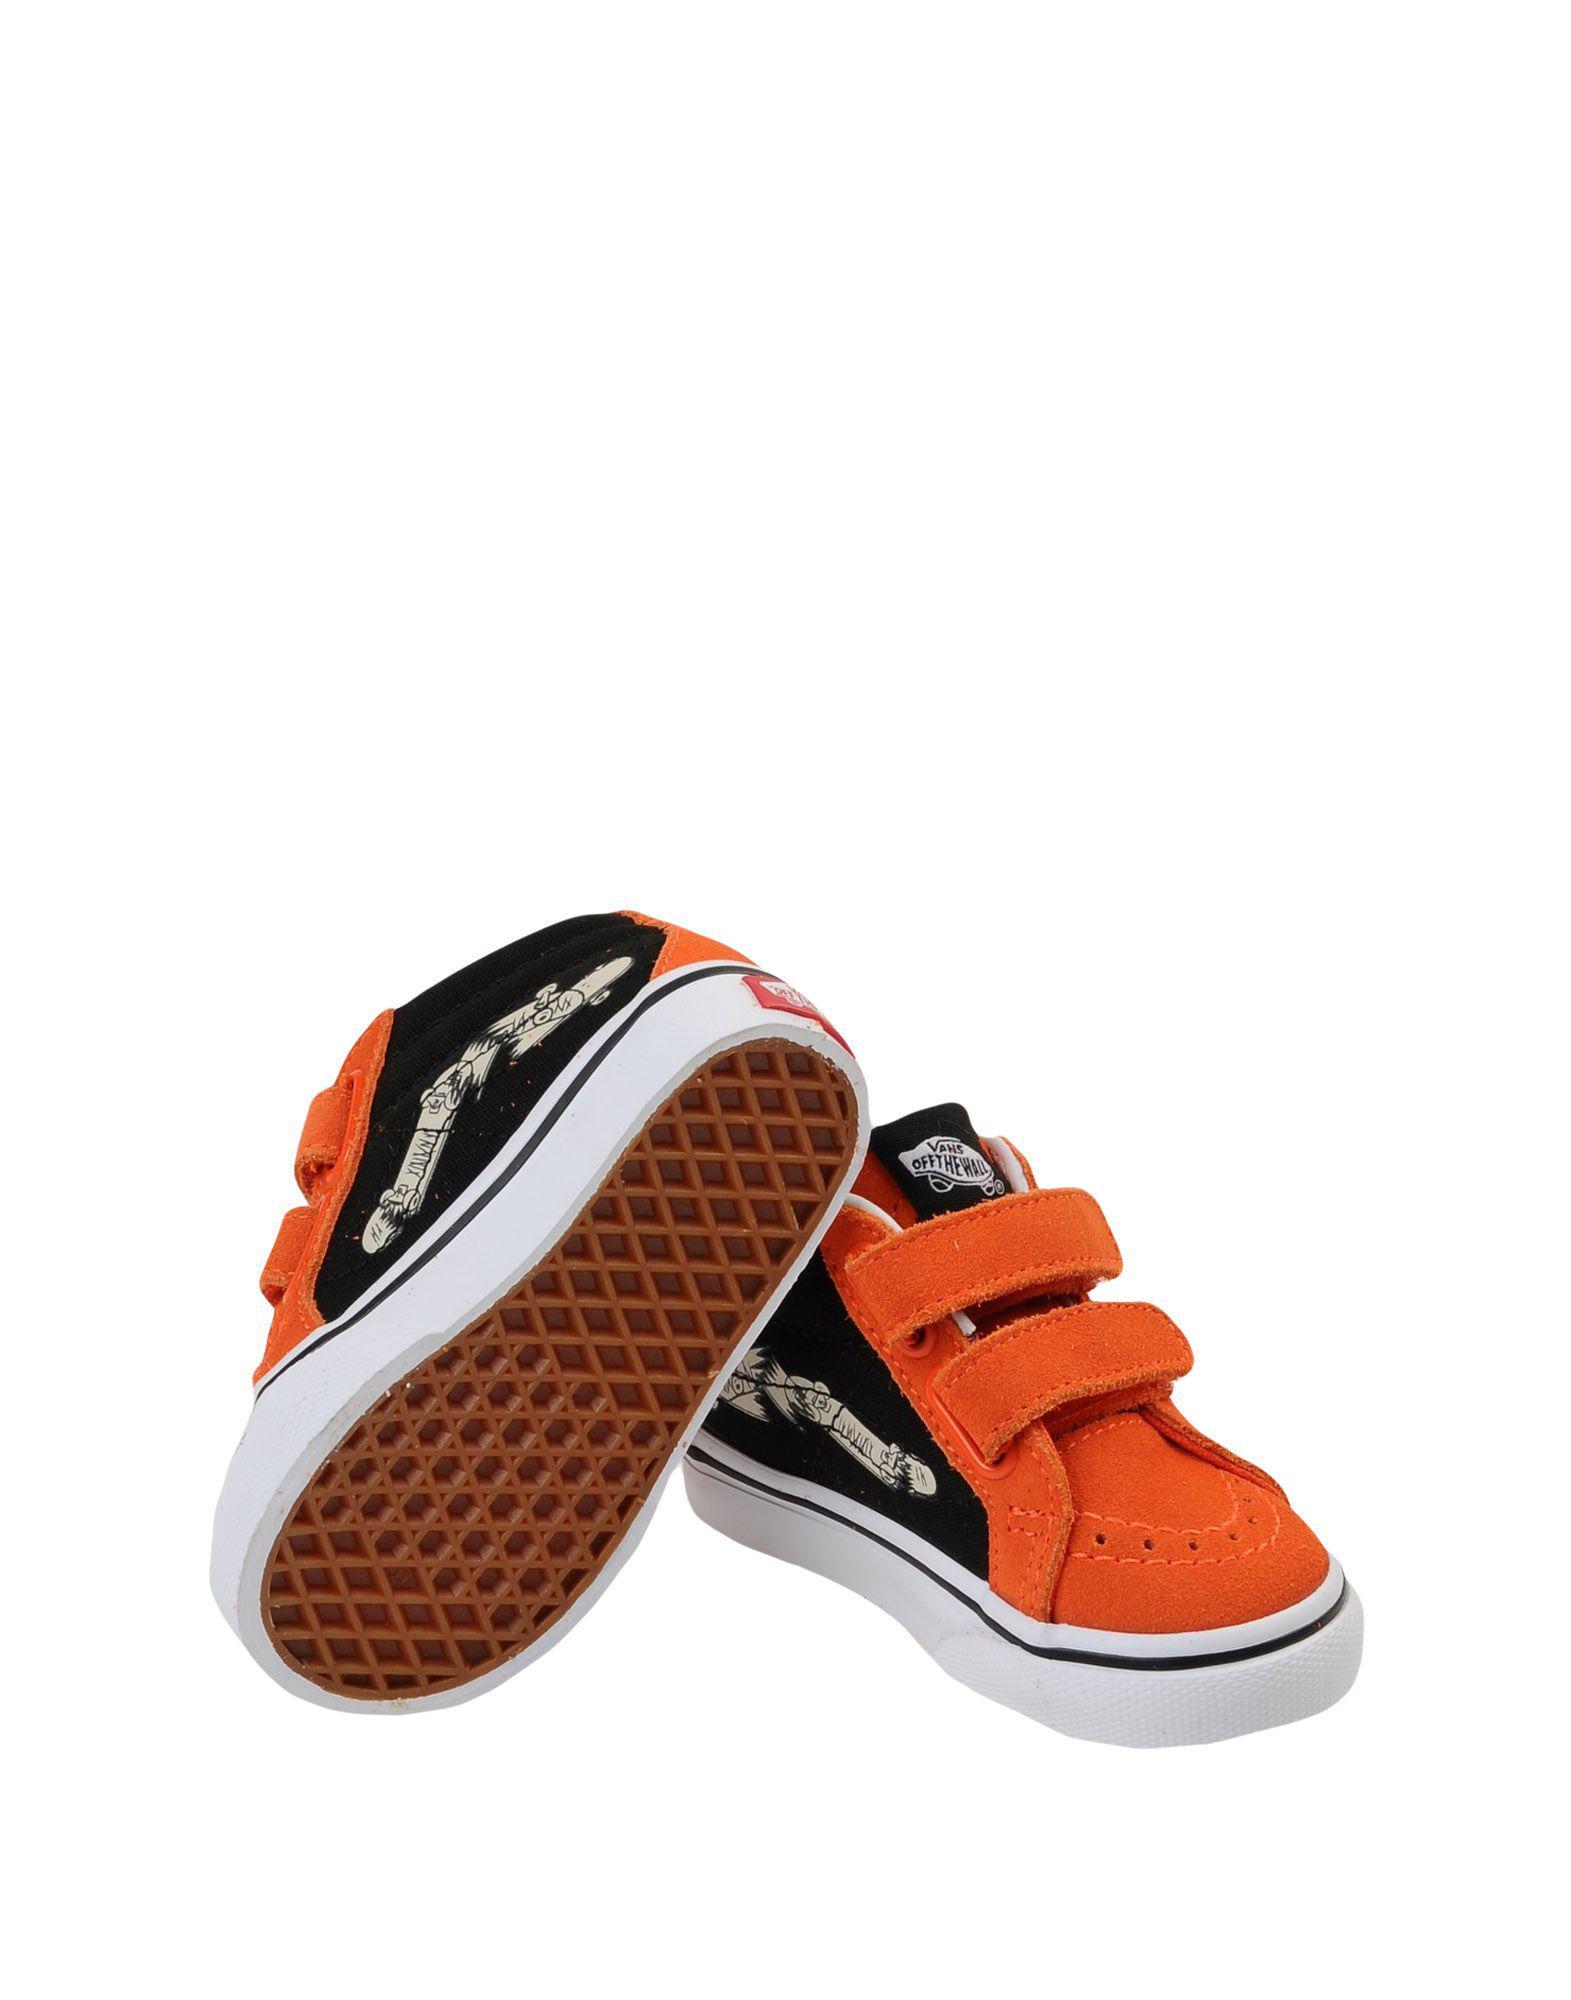 Vans Low-tops   Sneakers in Orange - Lyst 4fbc7c6a8